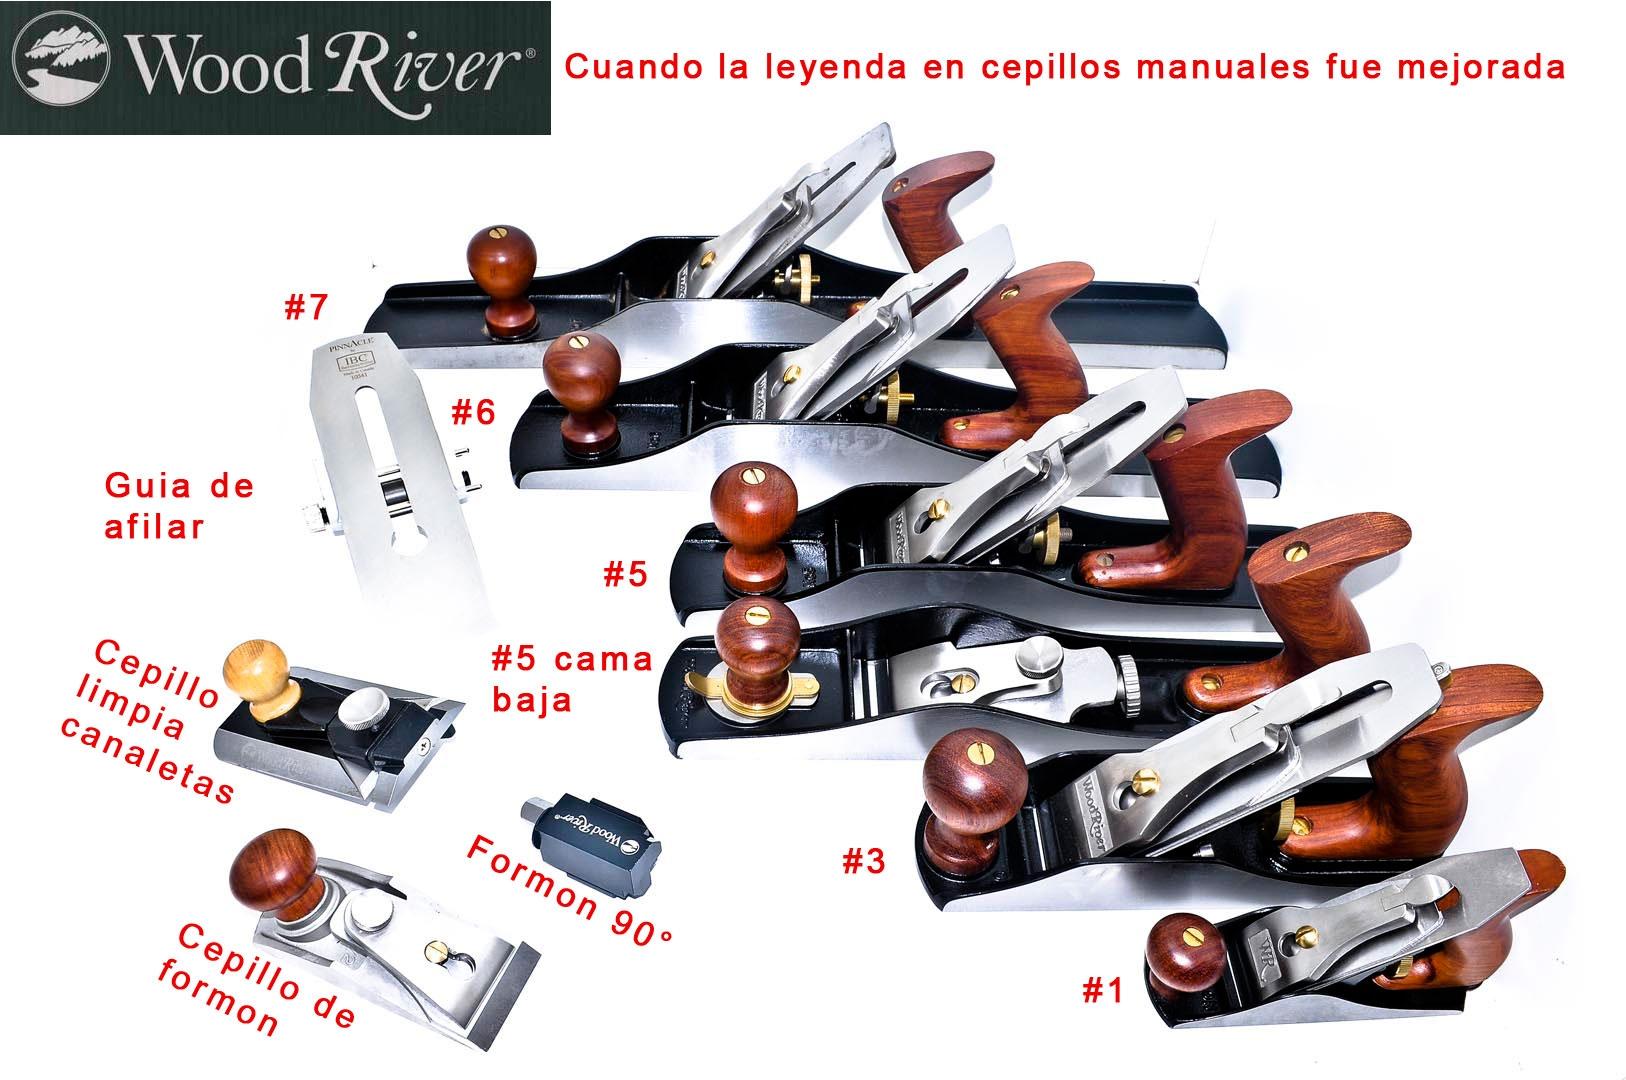 150875-Cepillo 5 bedrock garlopin para carpinteria WoodRiver 150875-max-5.